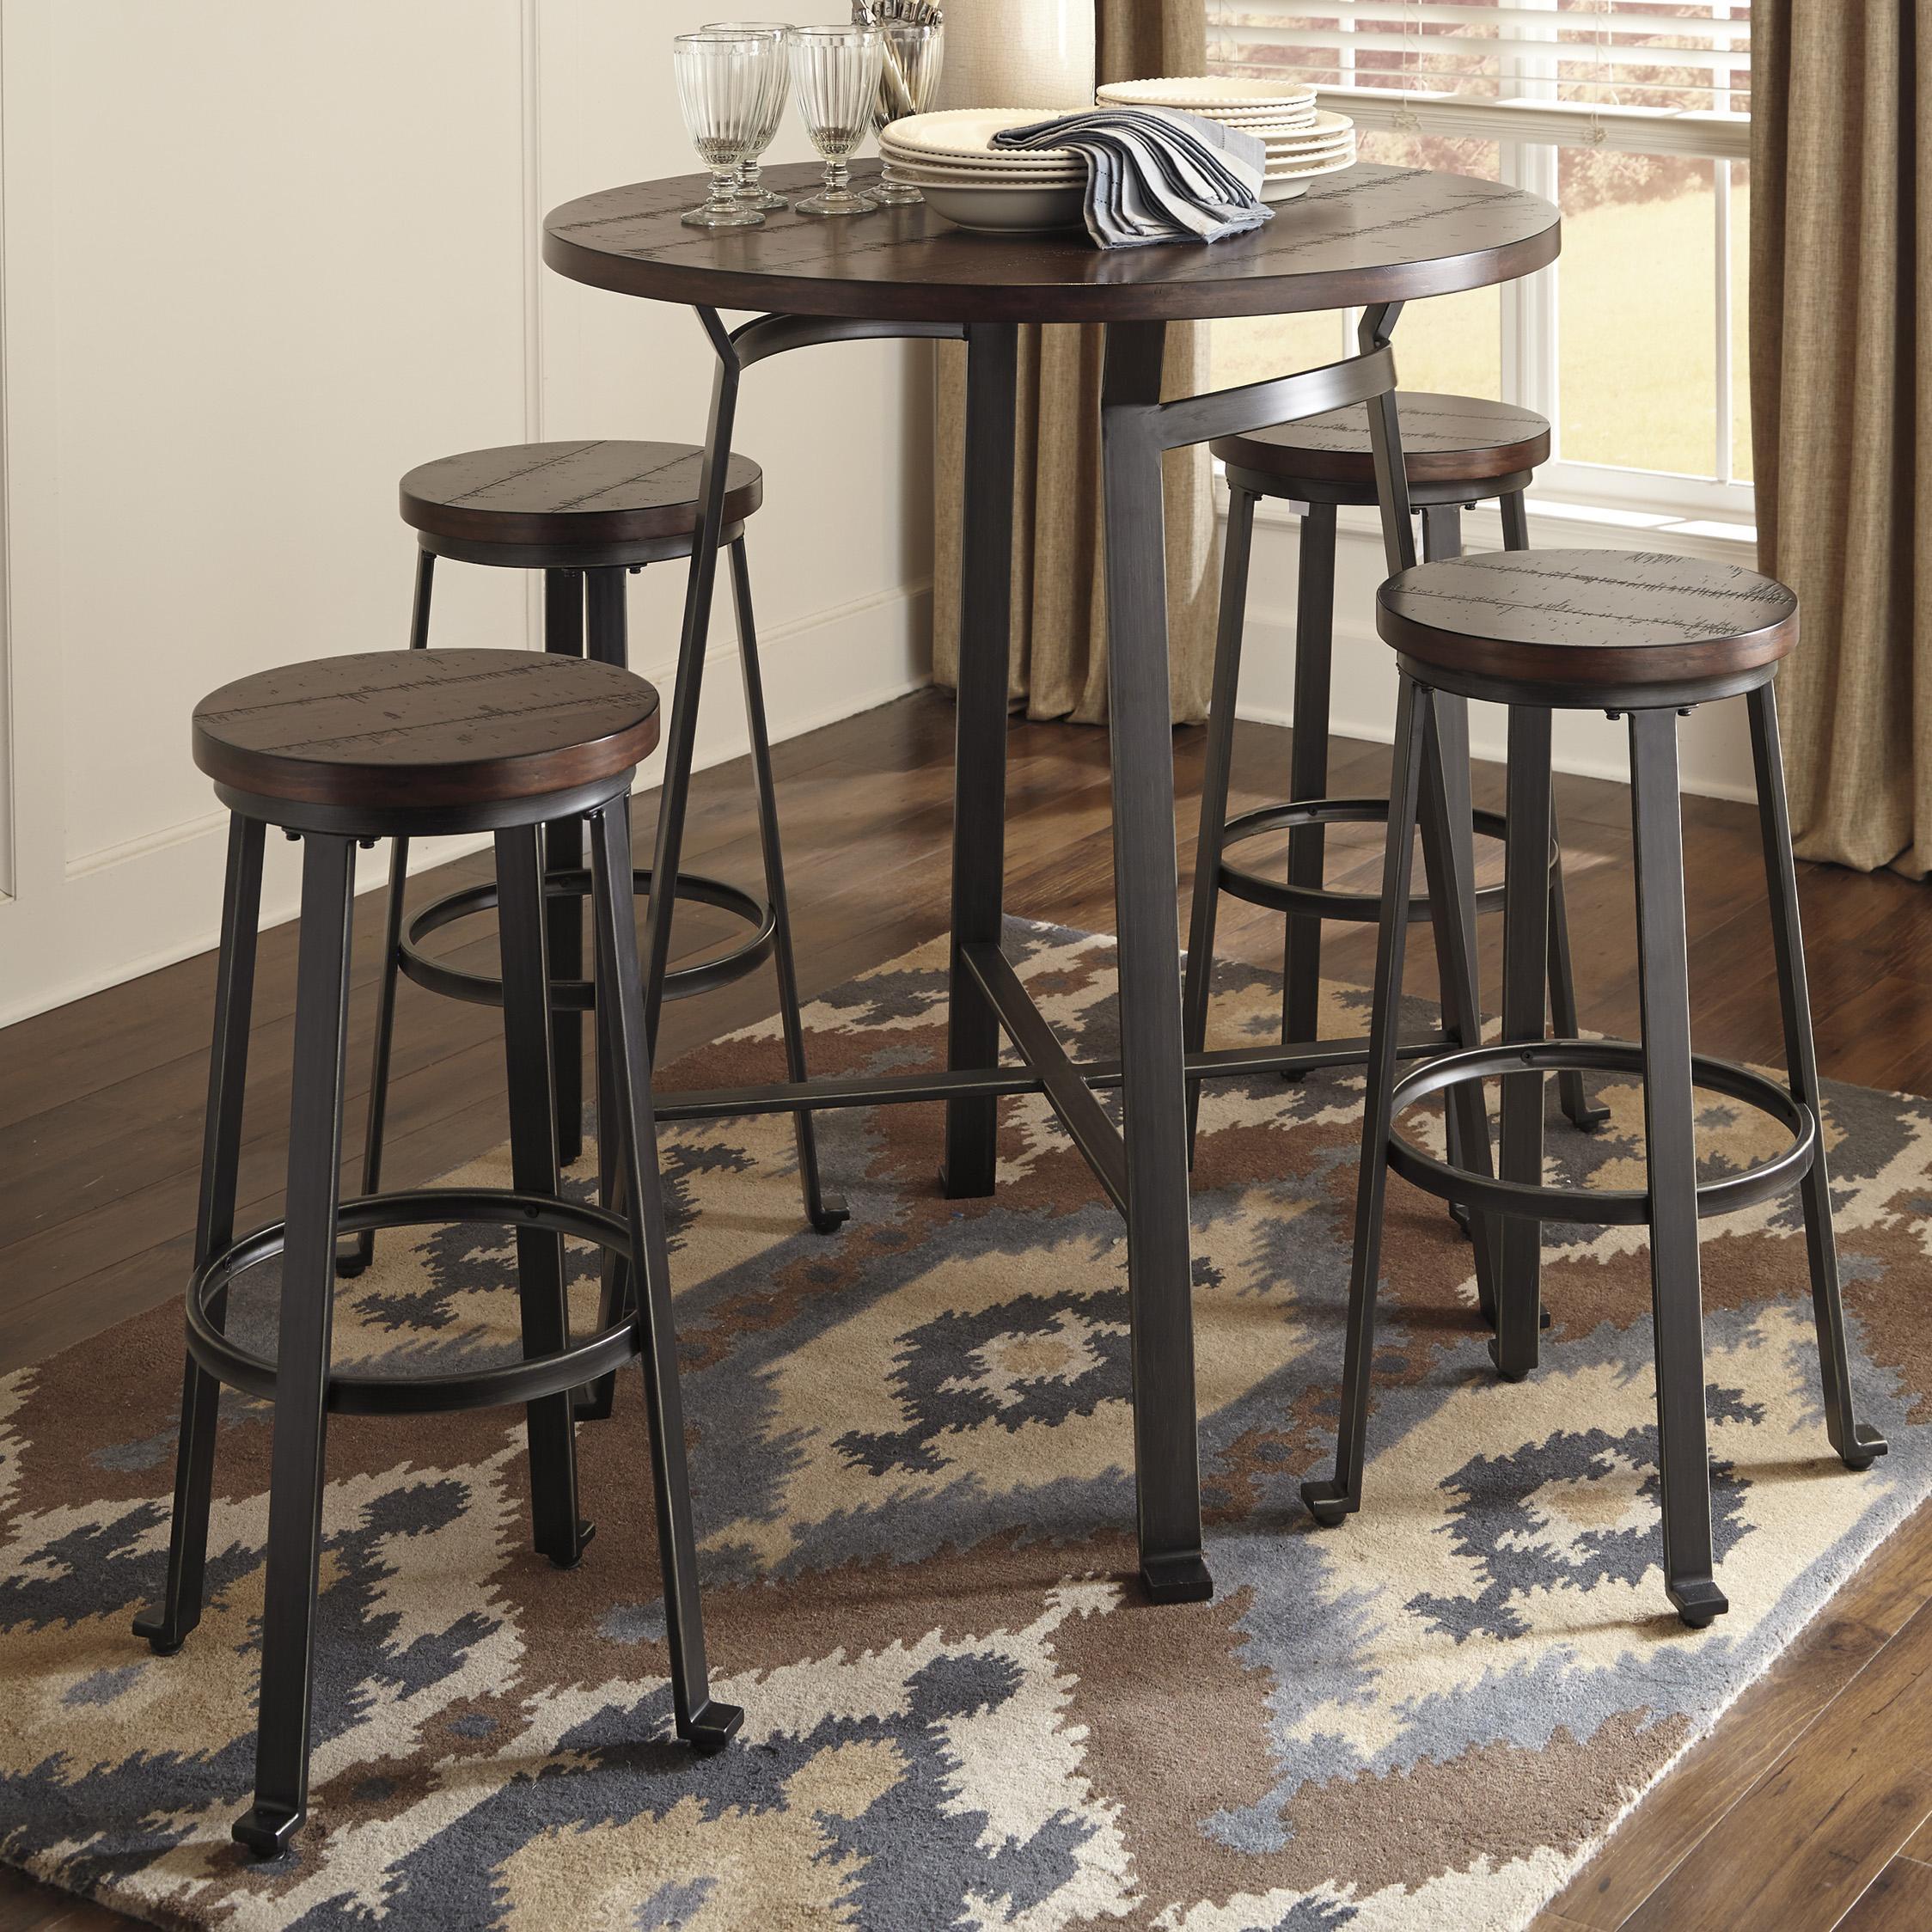 Charmant StyleLine Challiman 5 Piece Round Bar Table Set